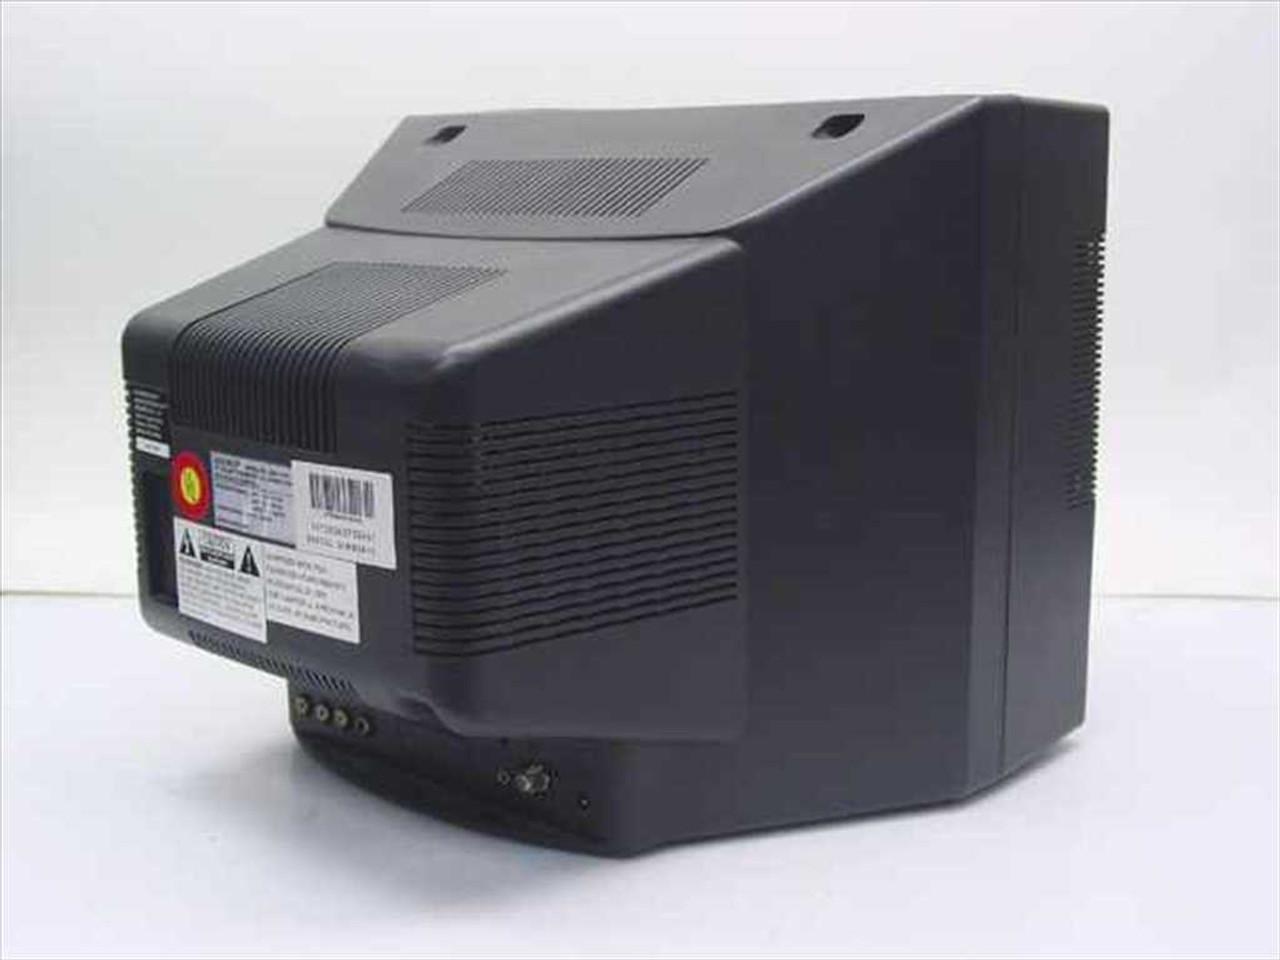 hight resolution of  audiovox avt 1475 13 color tv monitor dc powered